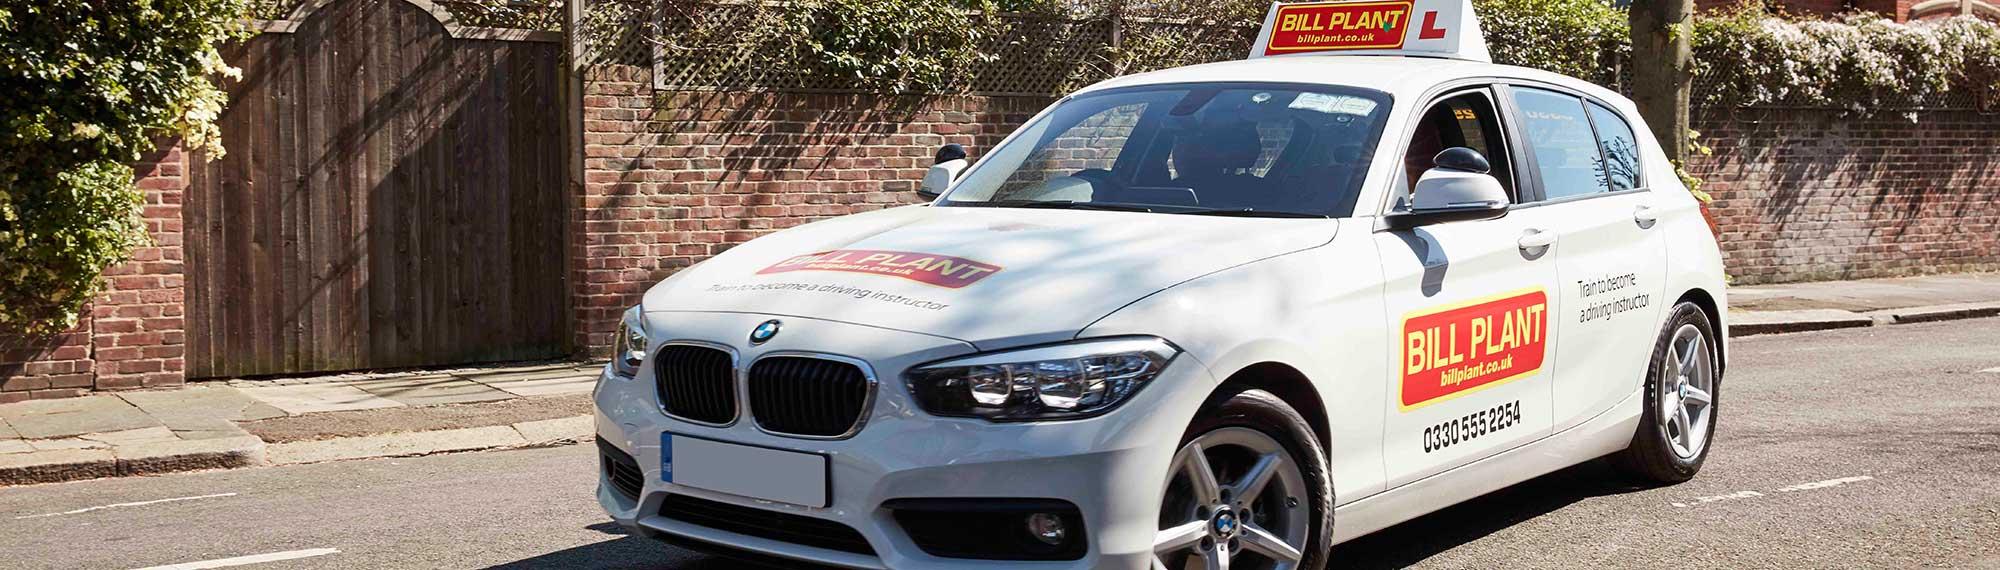 BMW Bill Plant Motorway Lessons